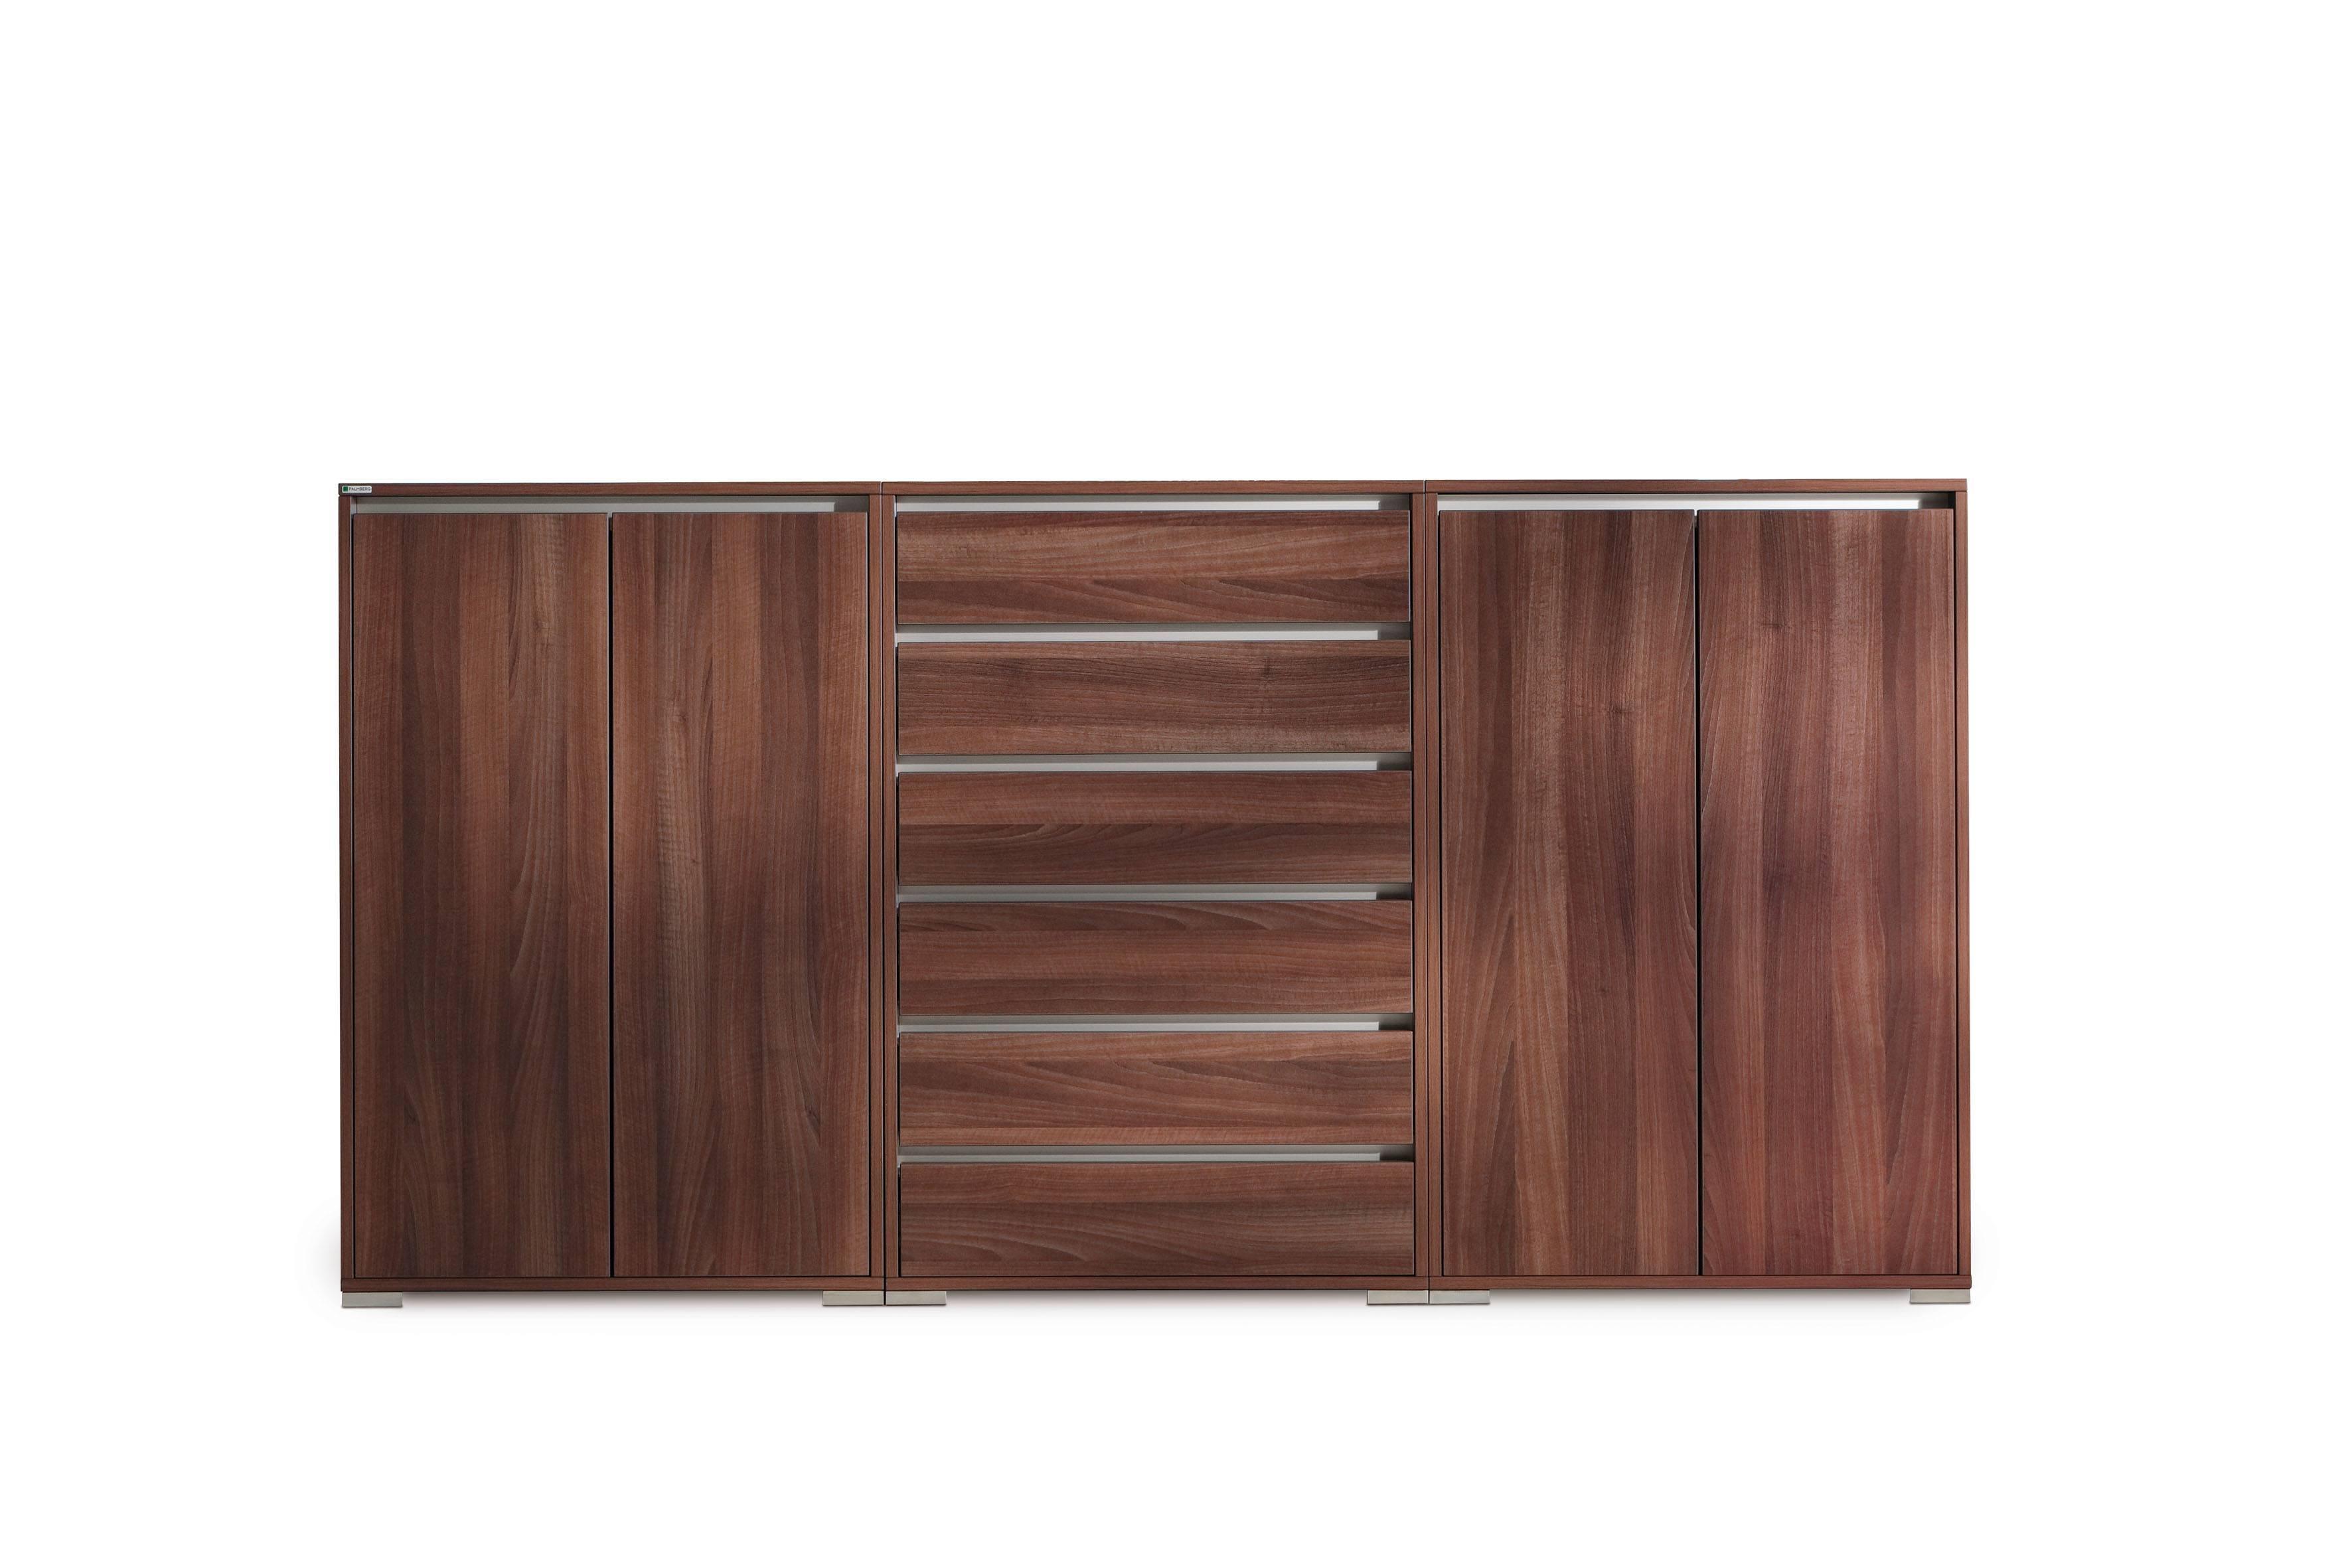 Palmberg Sideboard decor: Noten Natuur